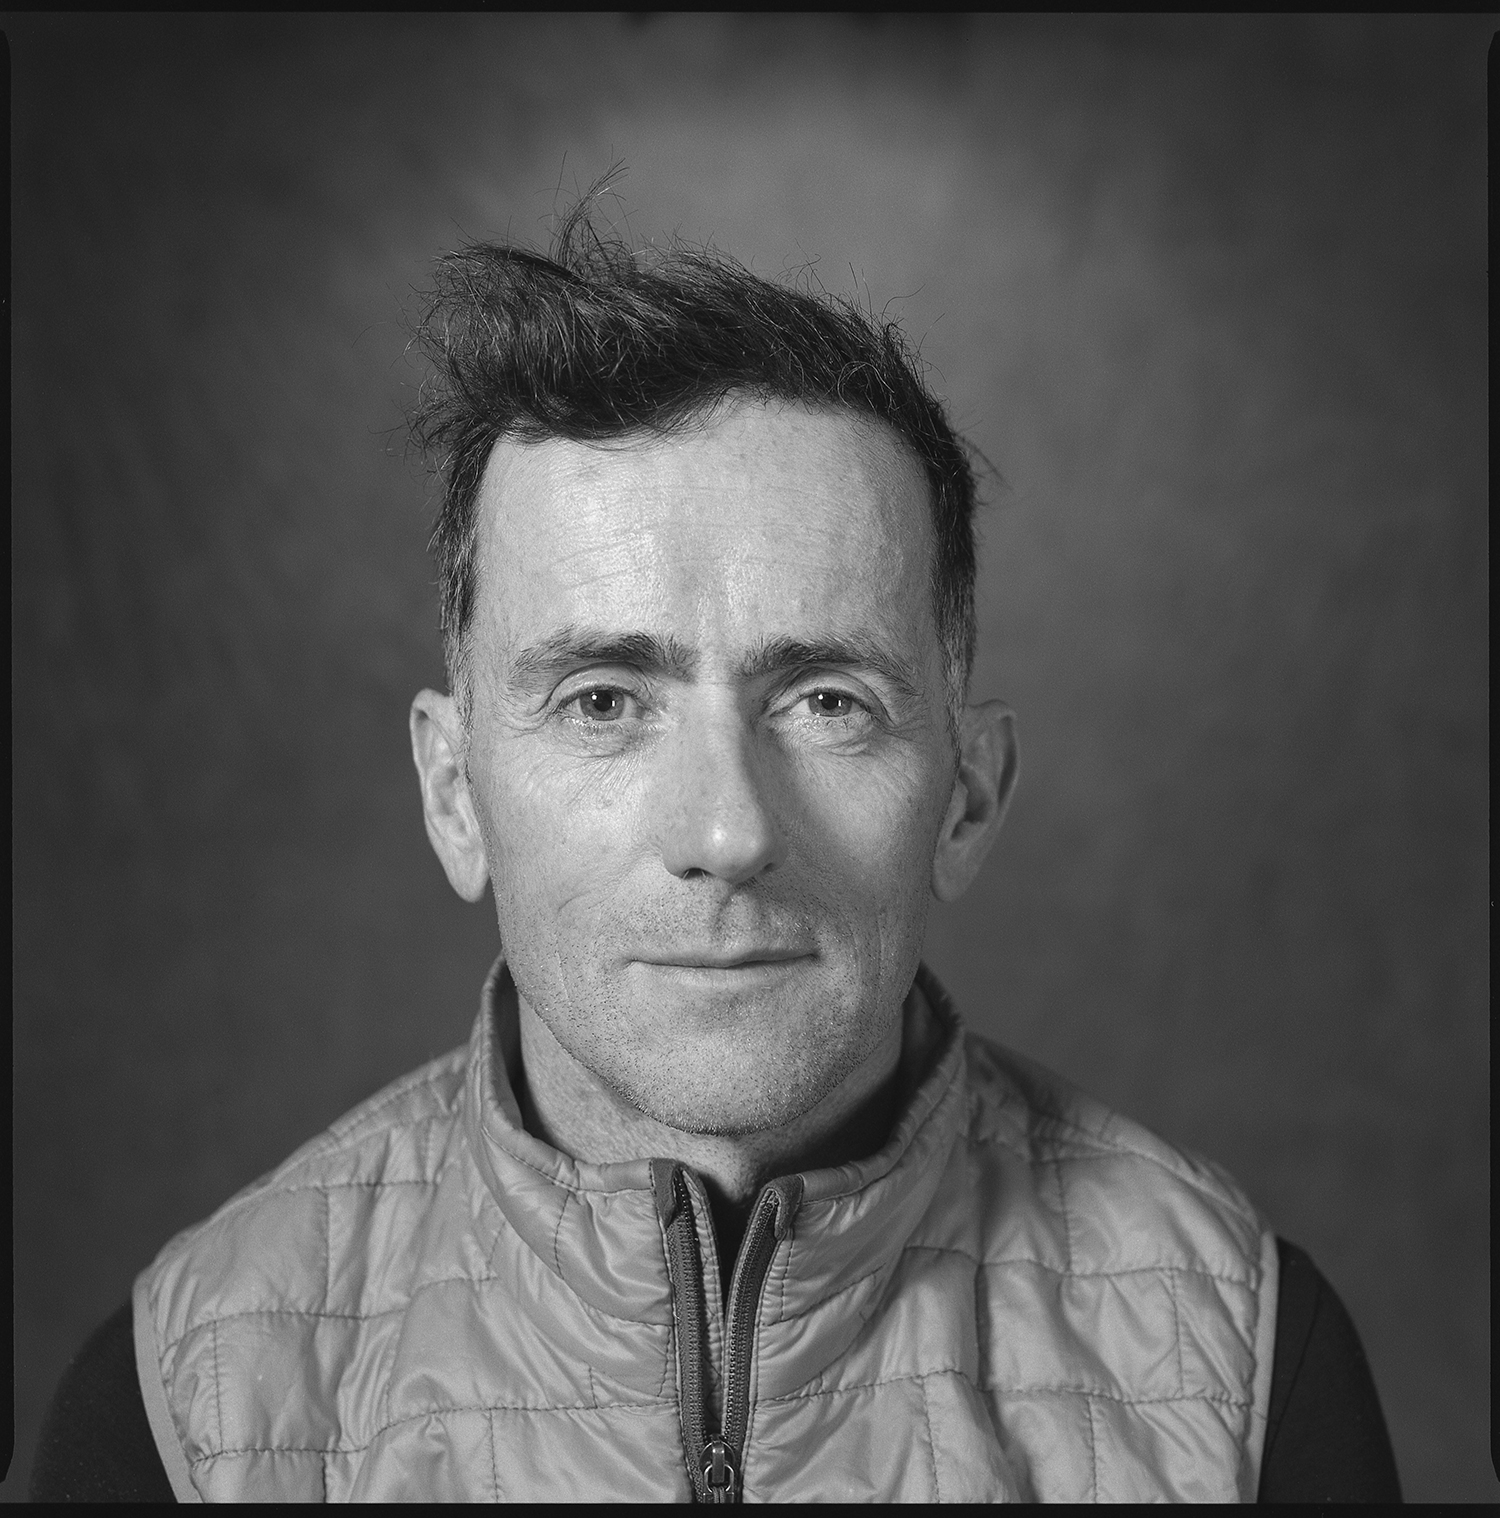 Mark Sherman, portrait shot at Studio Threee